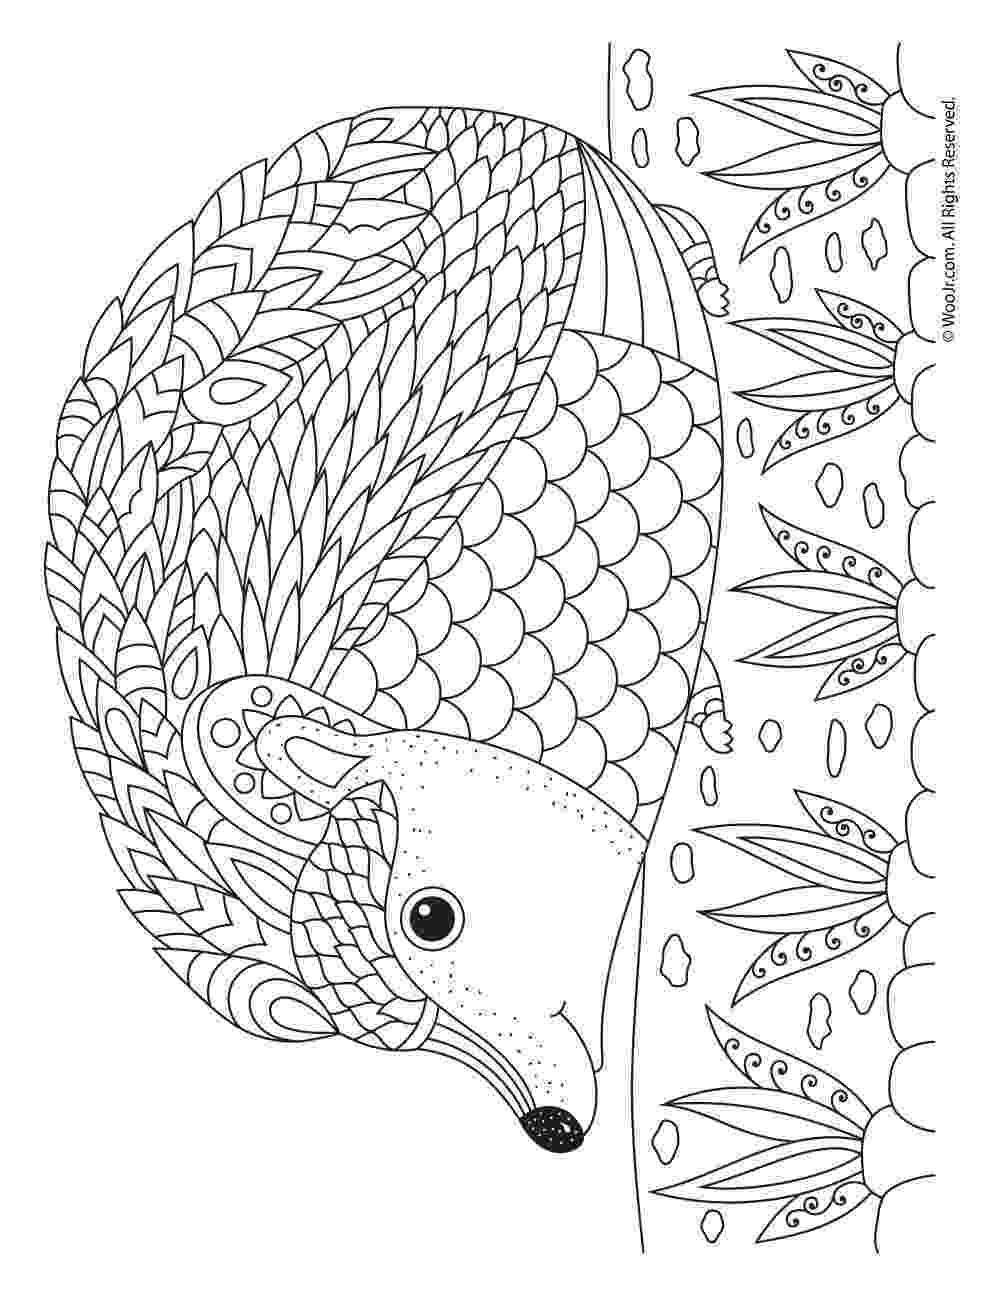 hedgehog coloring page hedgehog coloring pages coloringpages1001com coloring page hedgehog